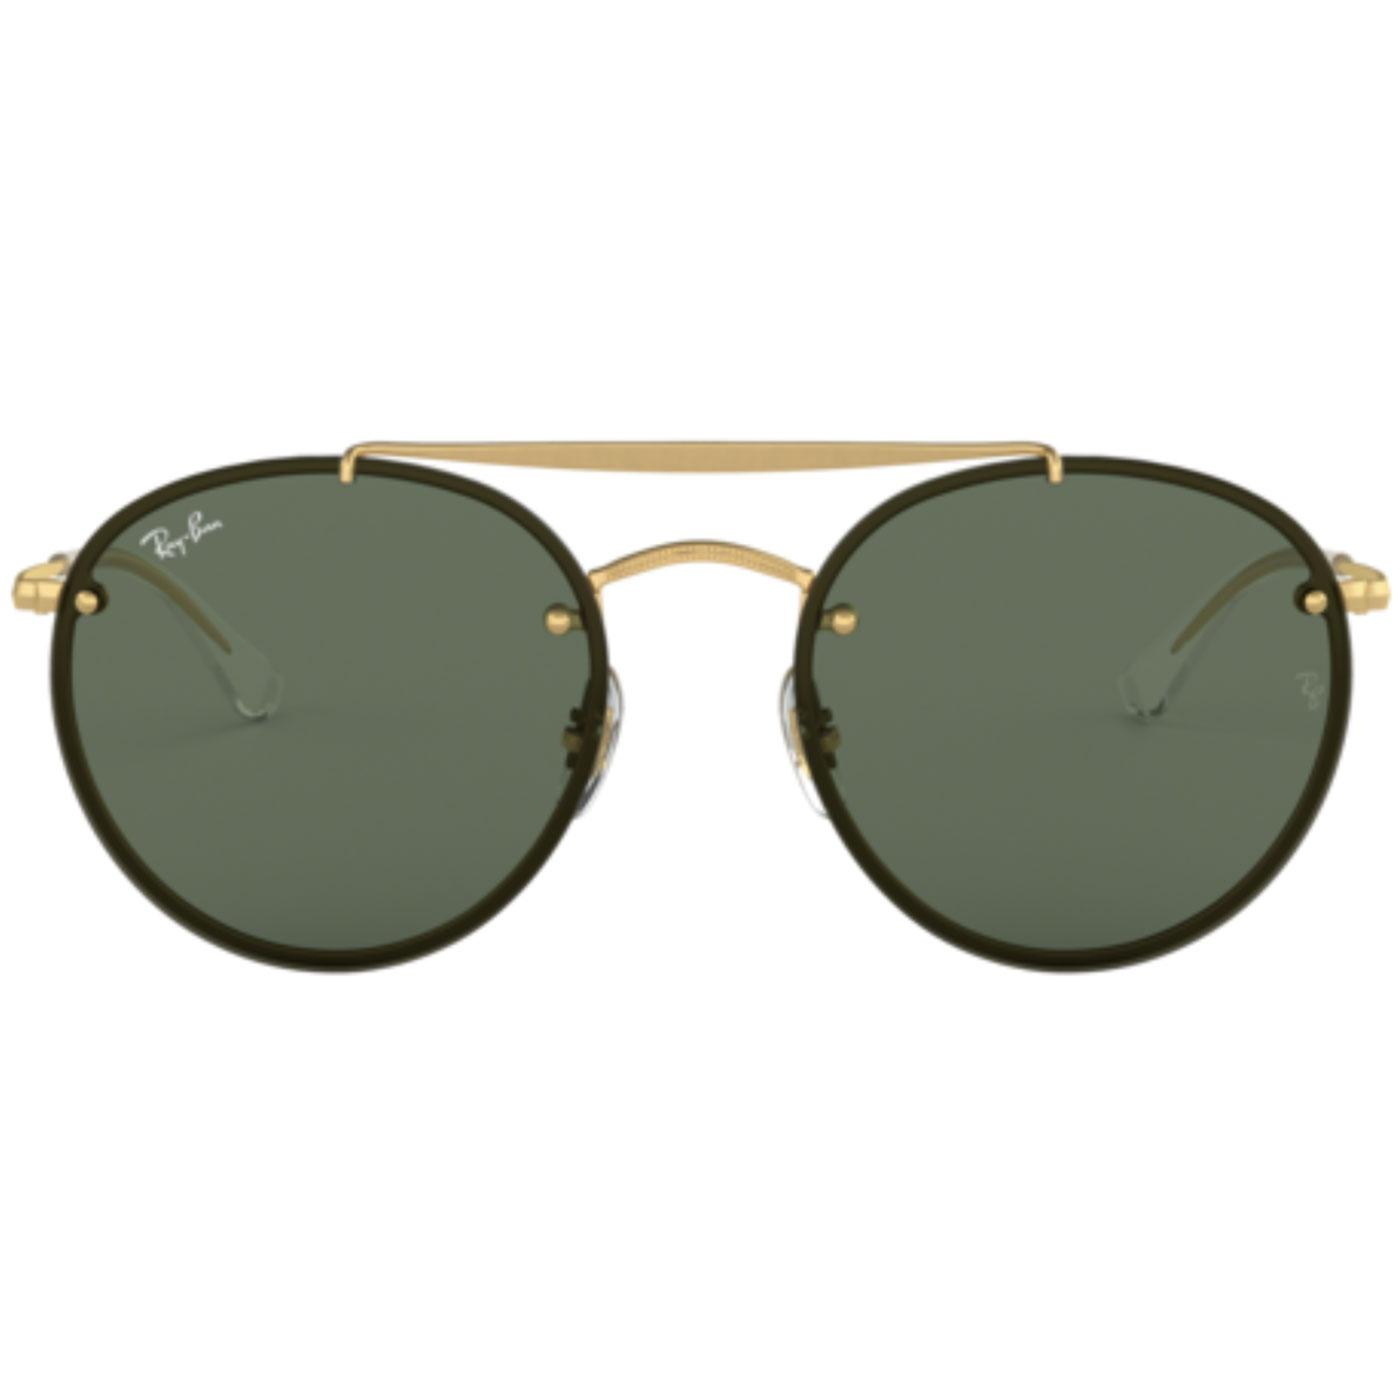 RAY-BAN Retro Double Bridge Blaze Round Sunglasses